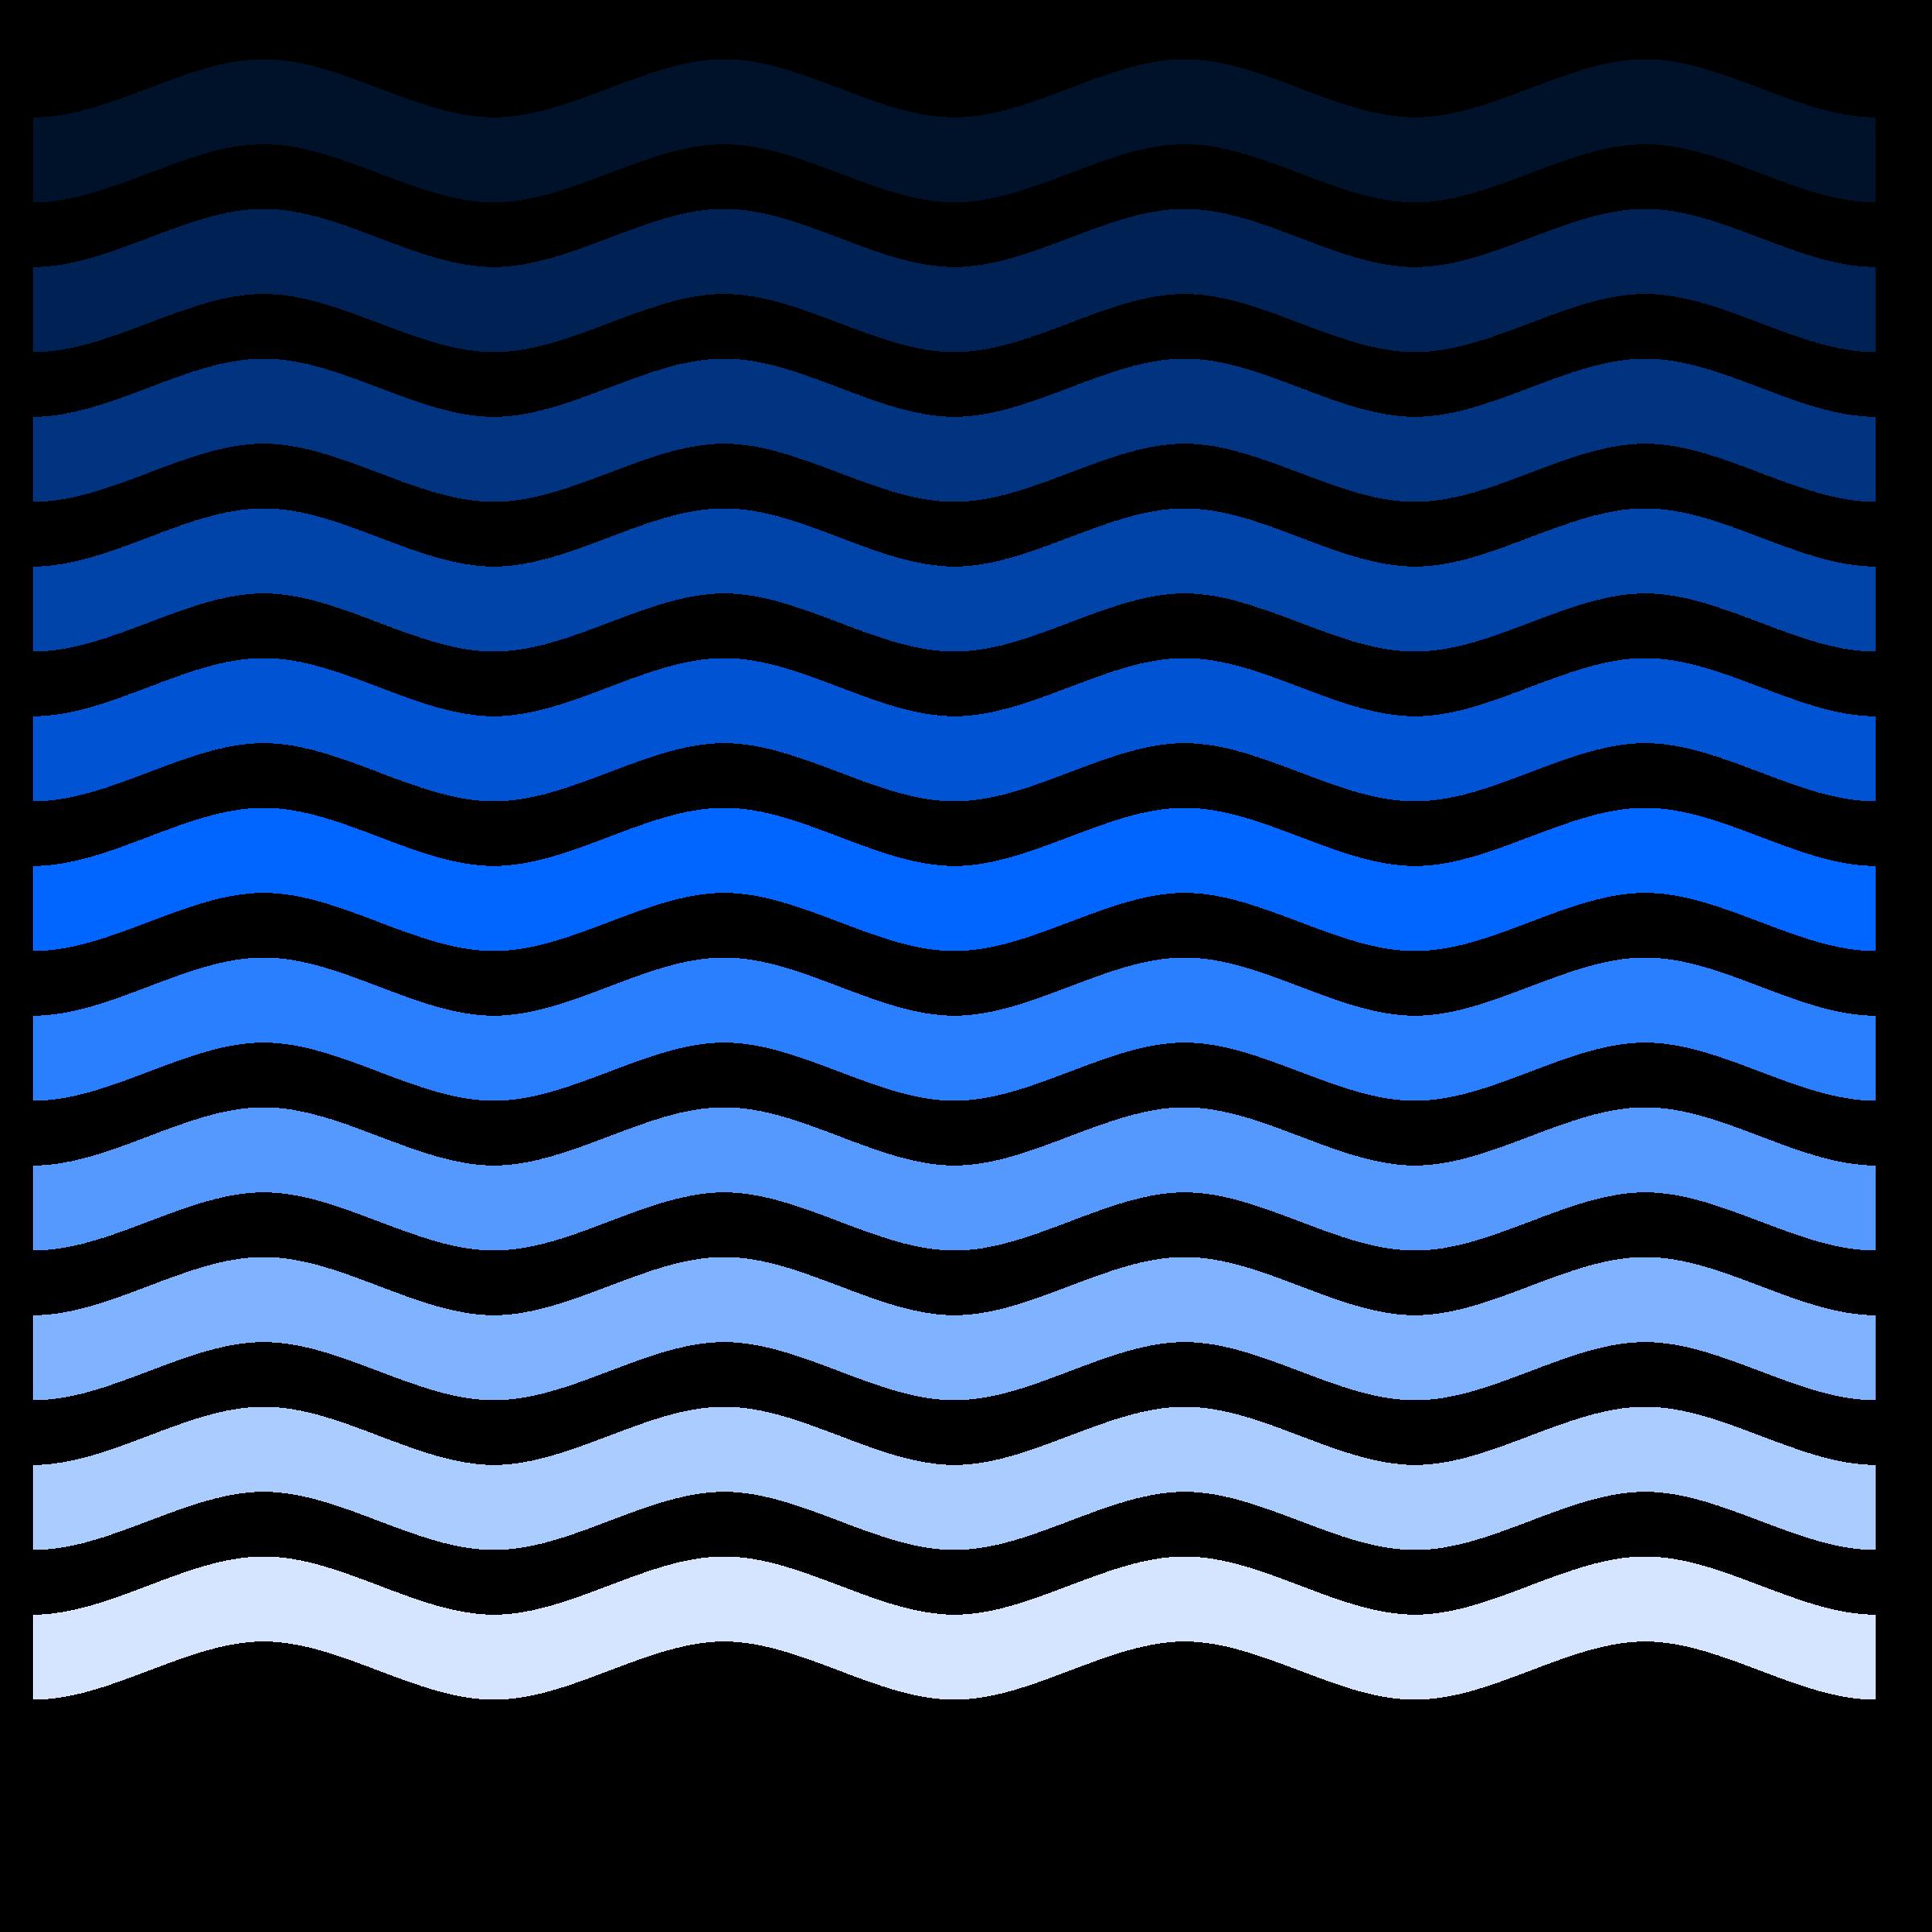 Ocean clipart simple. Water big image png